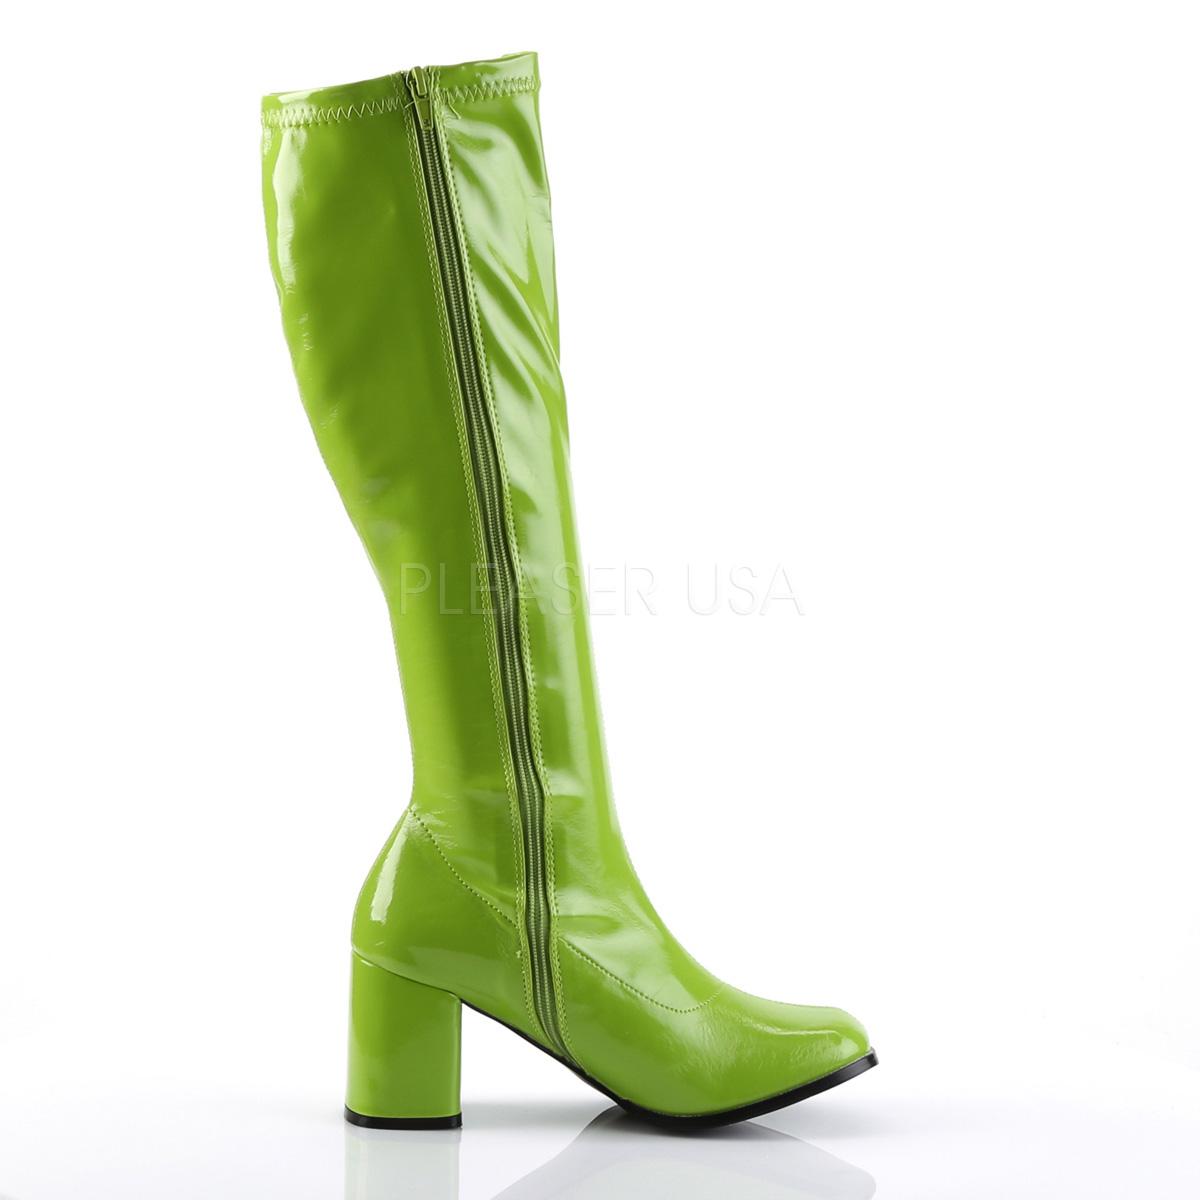 FUNTASMA(Pleaser) GOGO-300 ライムグリーン ニーハイブーツ GOGOブーツ コスプレ用ブーツ イベント 衣装 仮装 ハロウィン◆取り寄せ